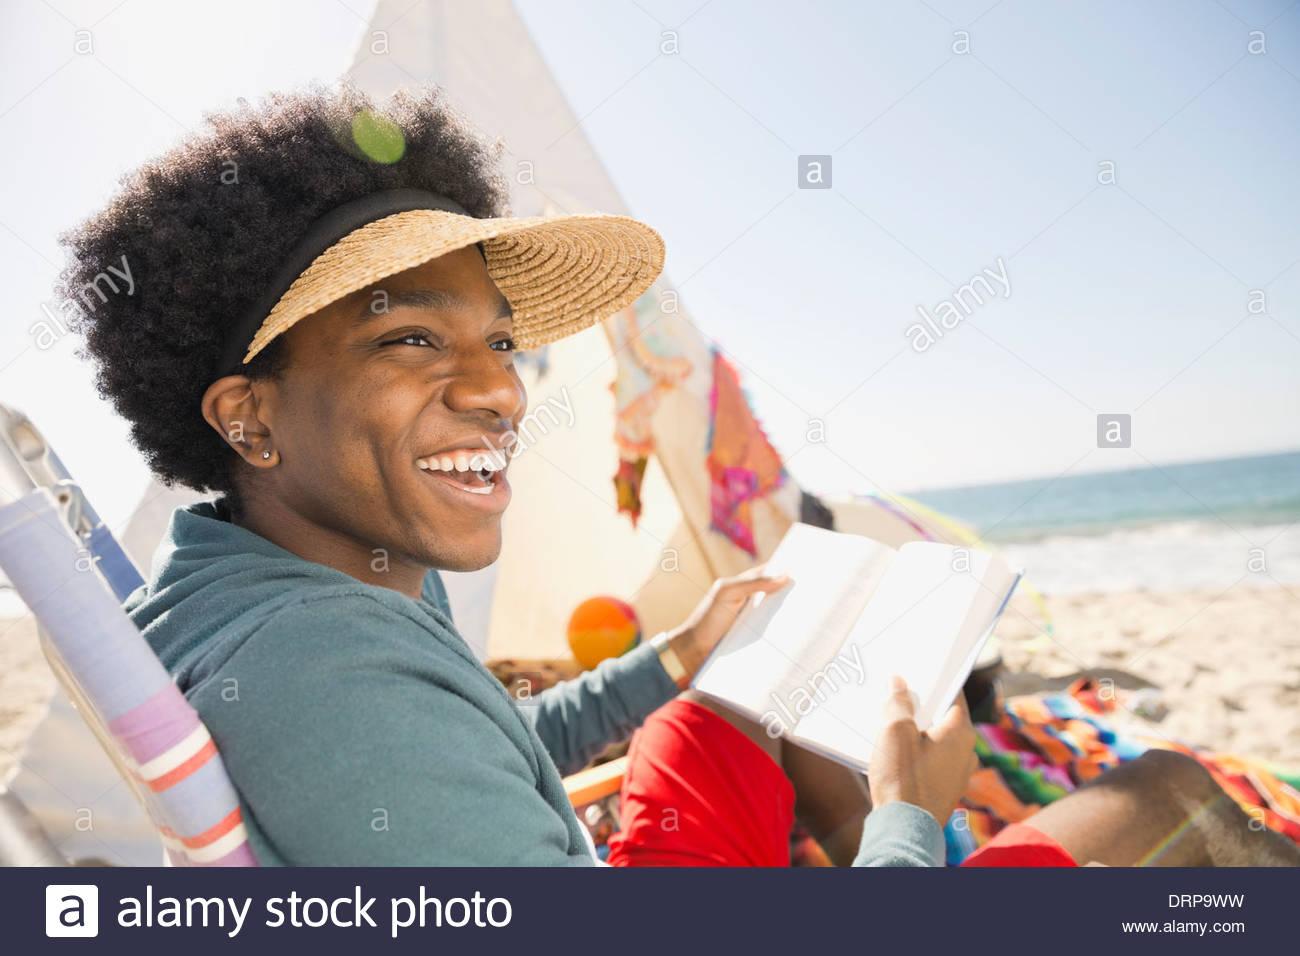 Cheerful man reading book on beach - Stock Image